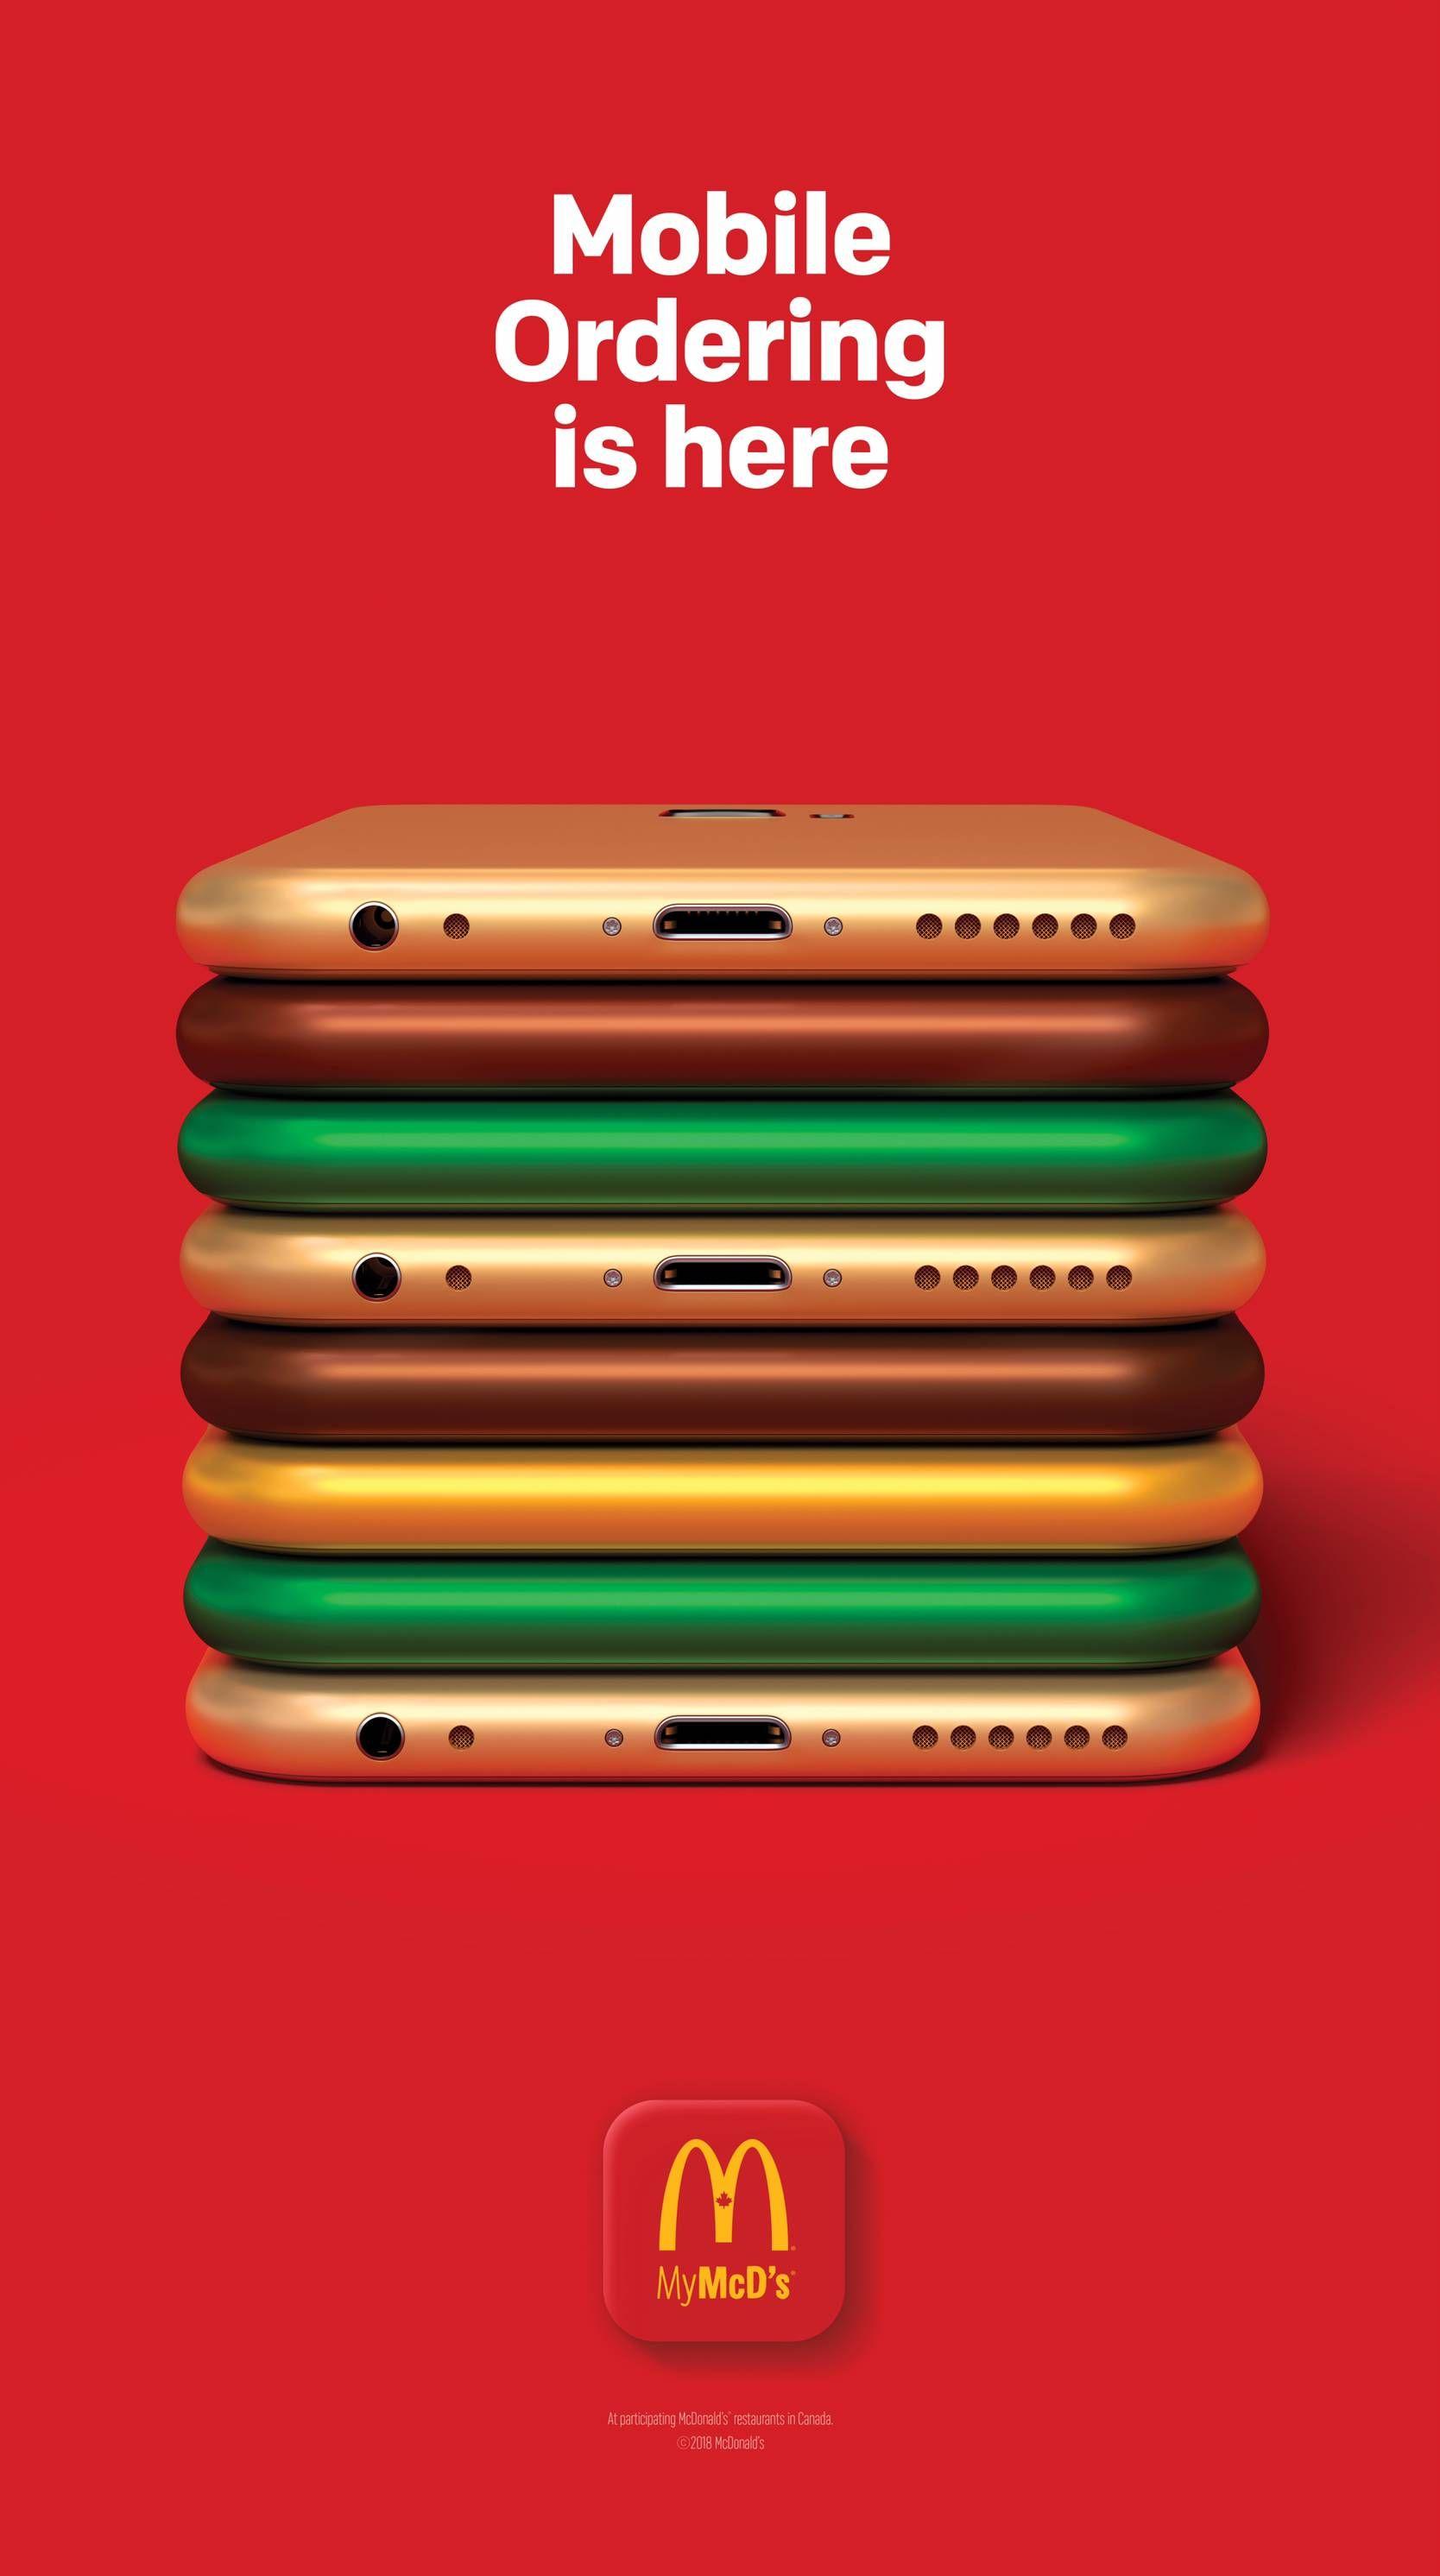 McDonalds: Mobile Ordering is here (4750x8500) #advertising #marketing #online #RT #busi… | Creative advertising campaign, Creative advertising design, Ads creative